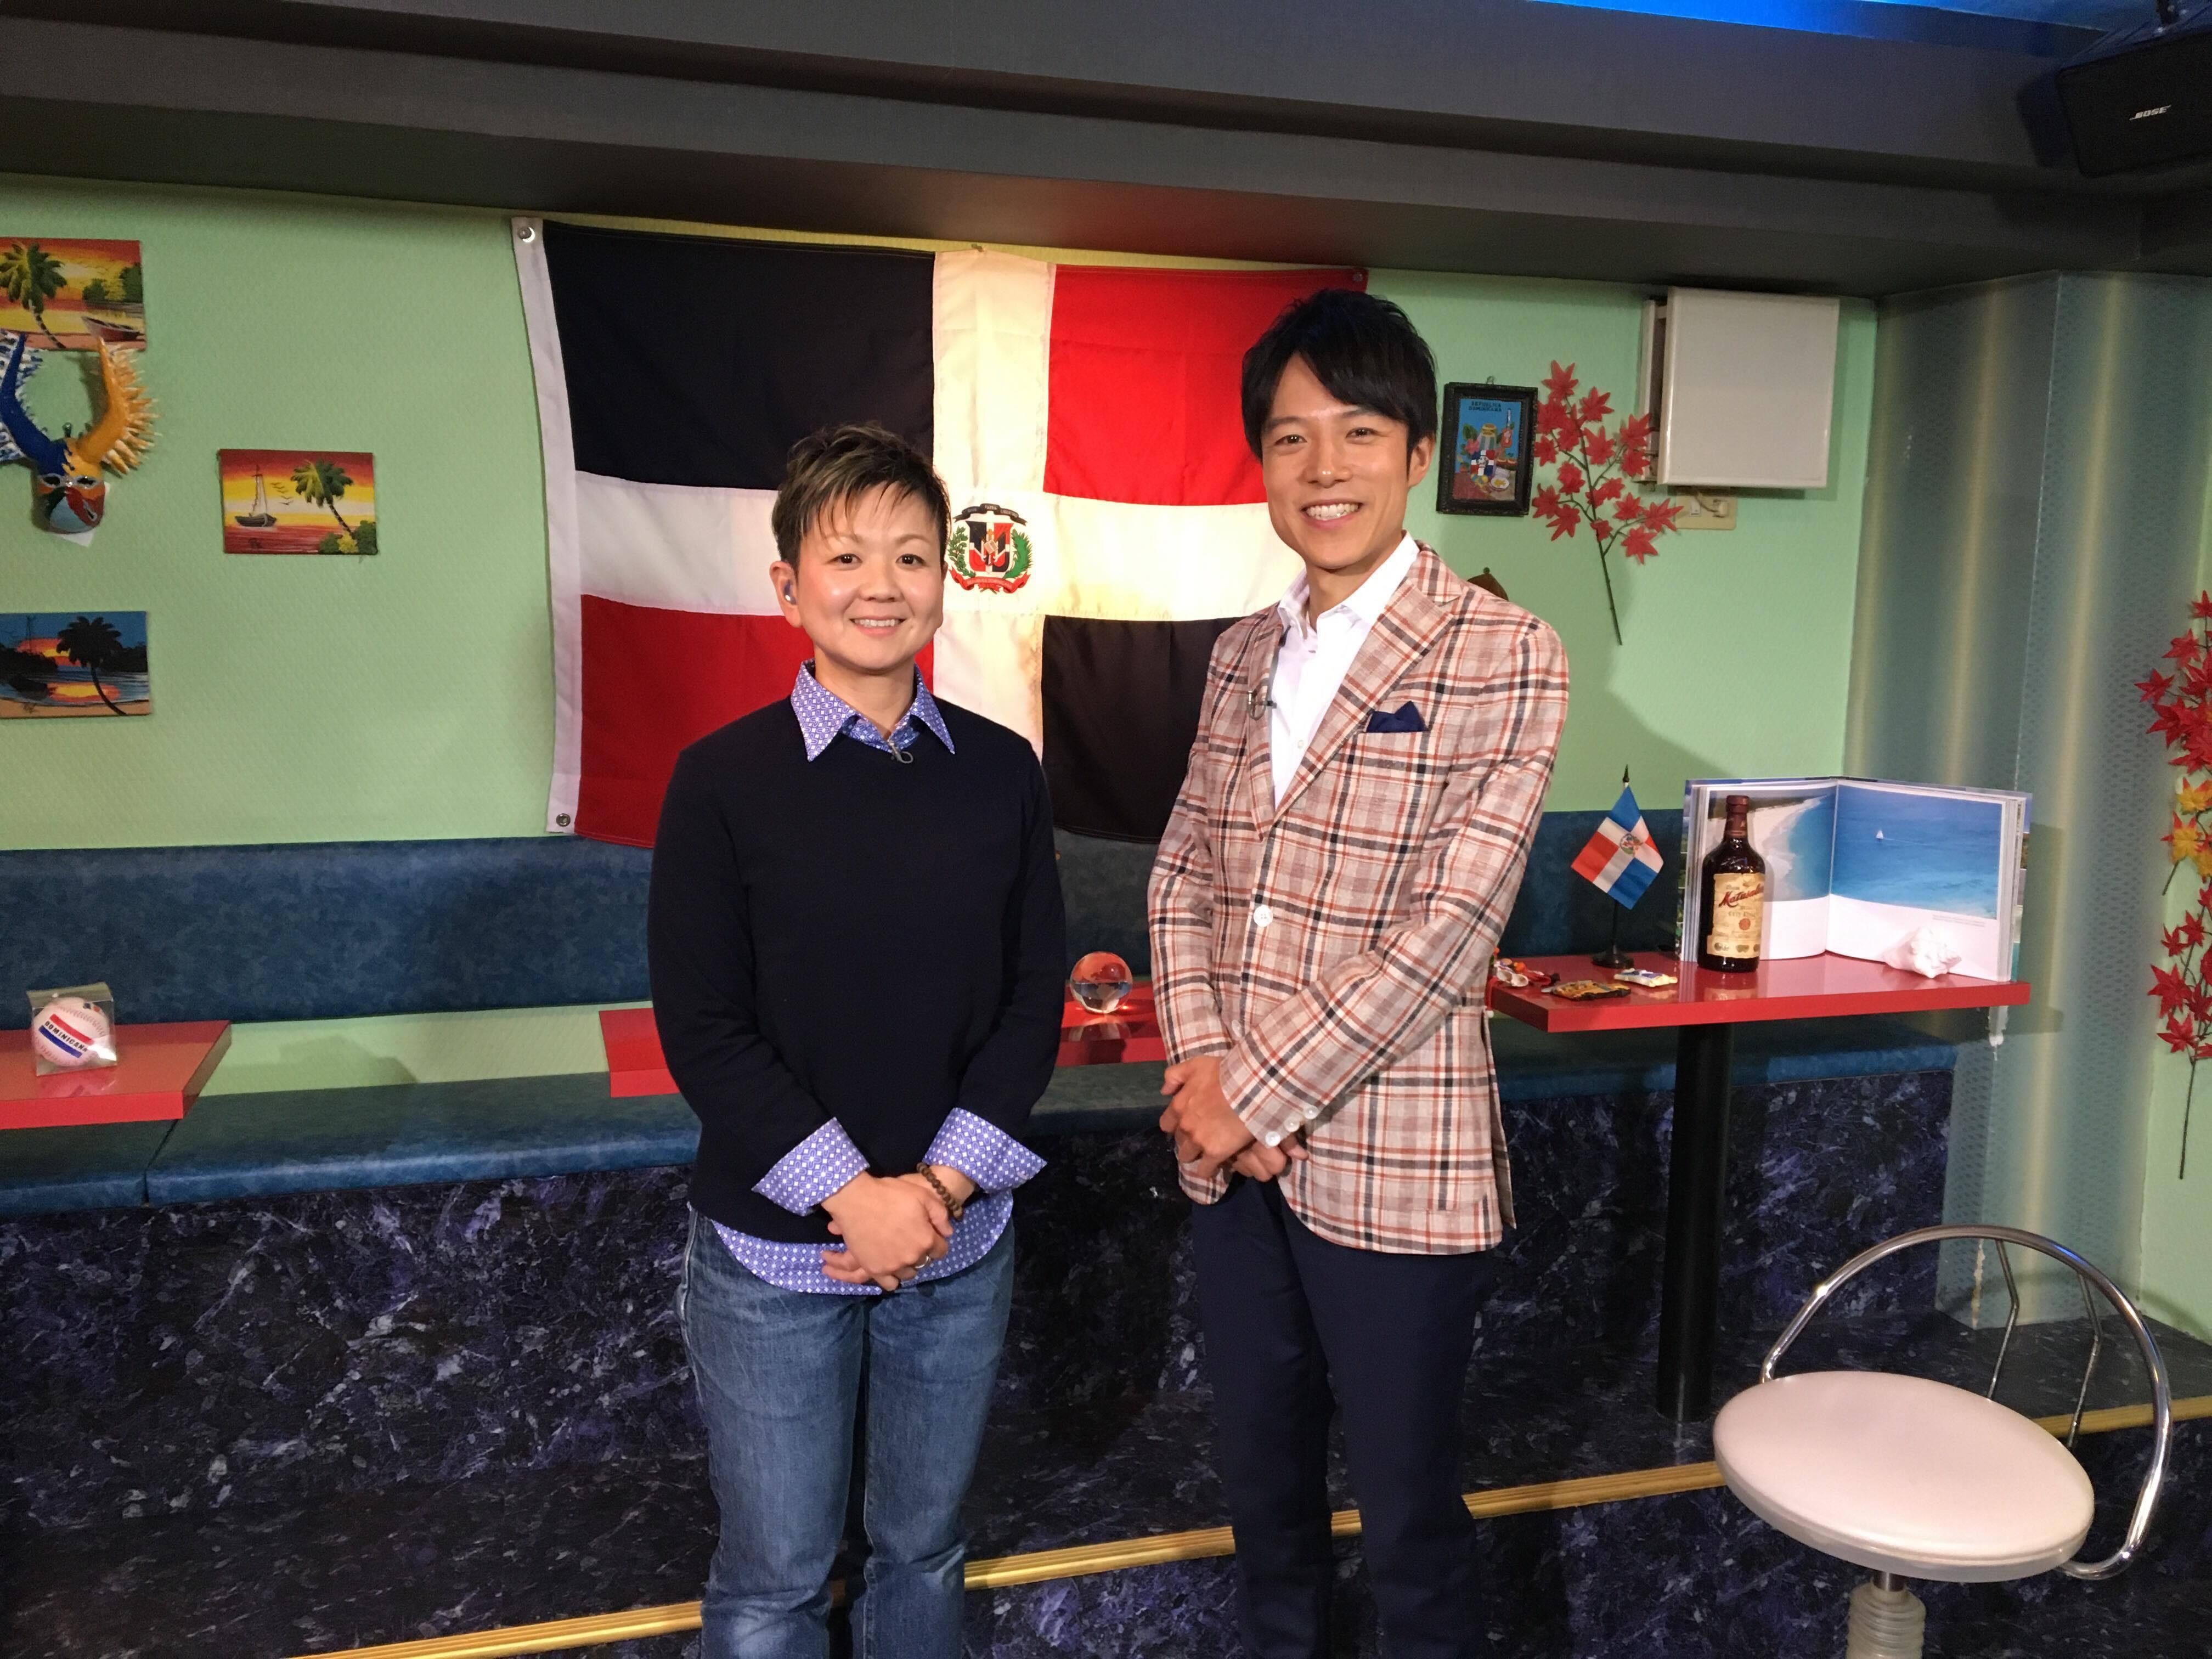 NHKによる廣瀬芽里さんインタビュー! (Entrevista por NHK a la srta. Meri Hirose)